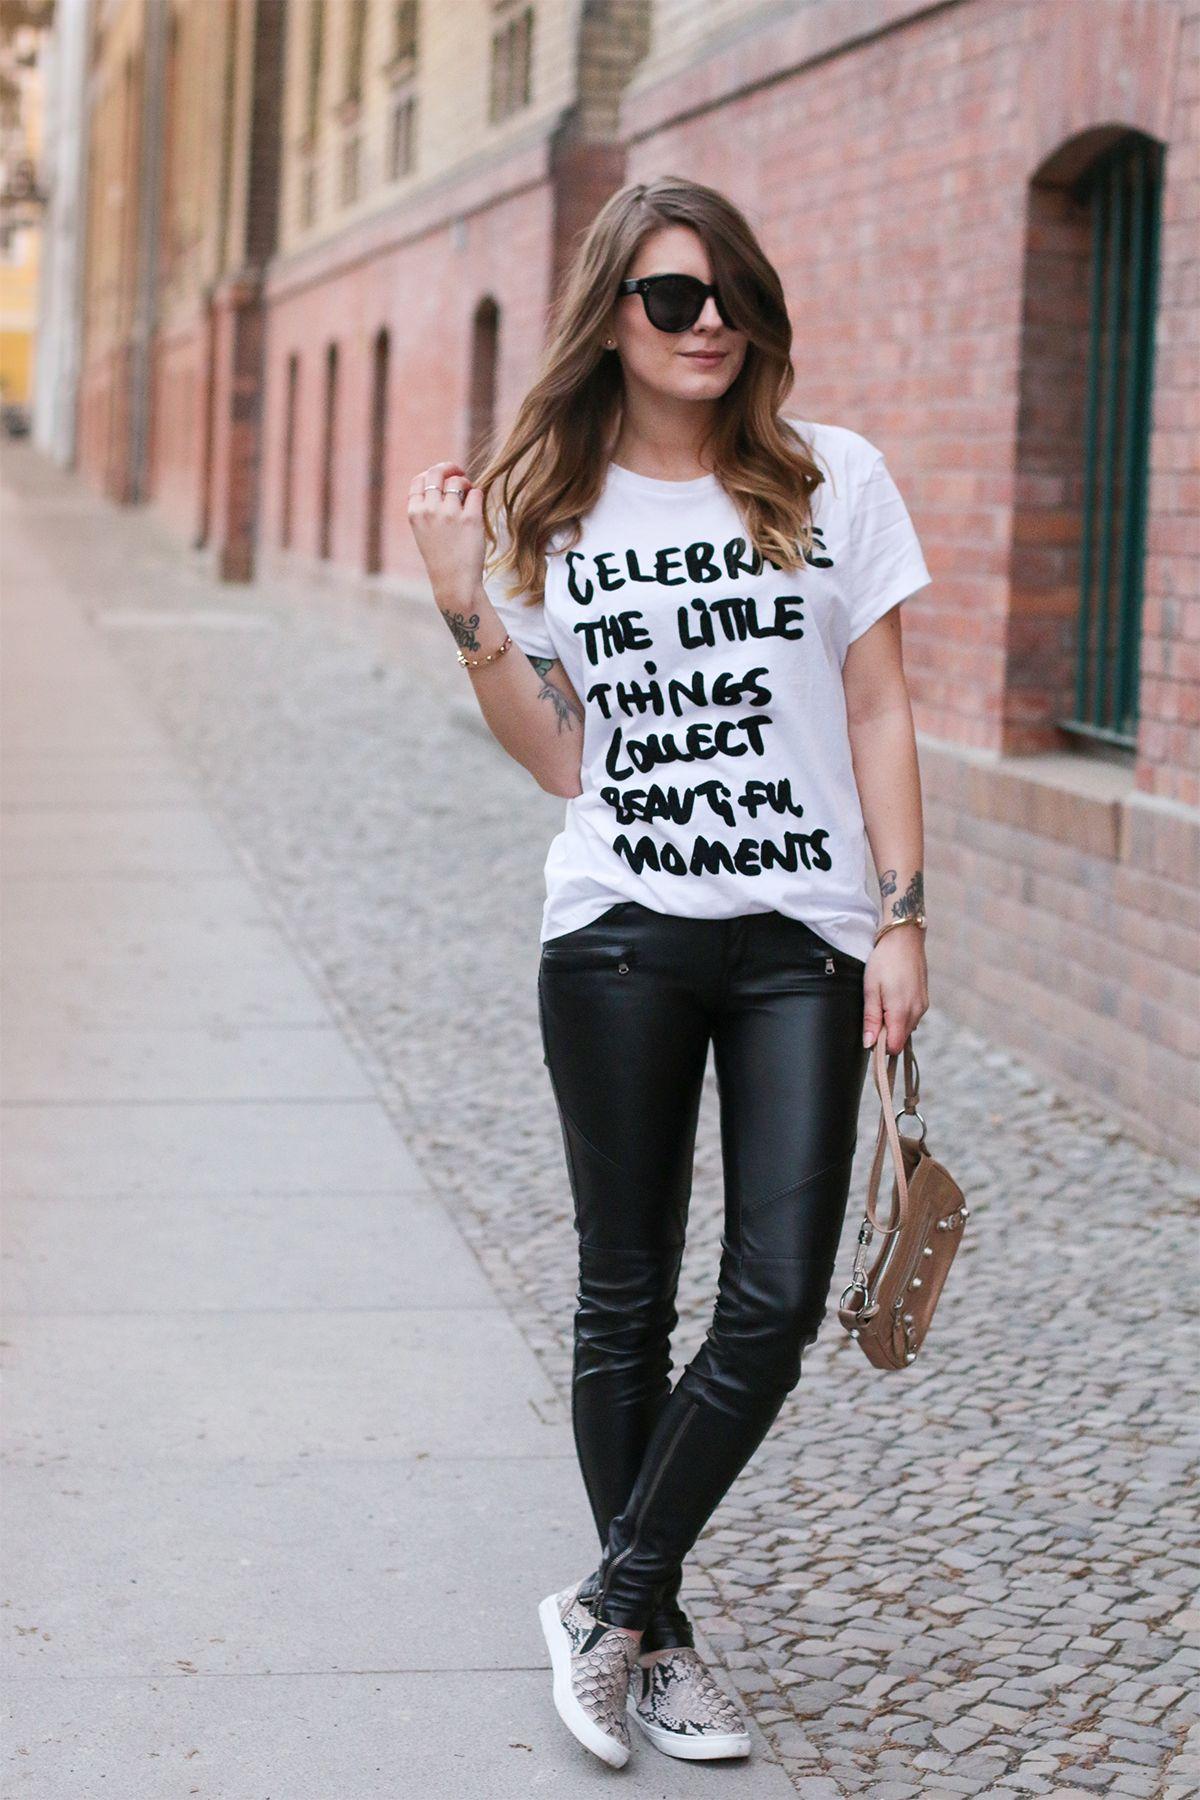 outfit: statement shirt. | Statement shirt design, Statement shirt, Outfits